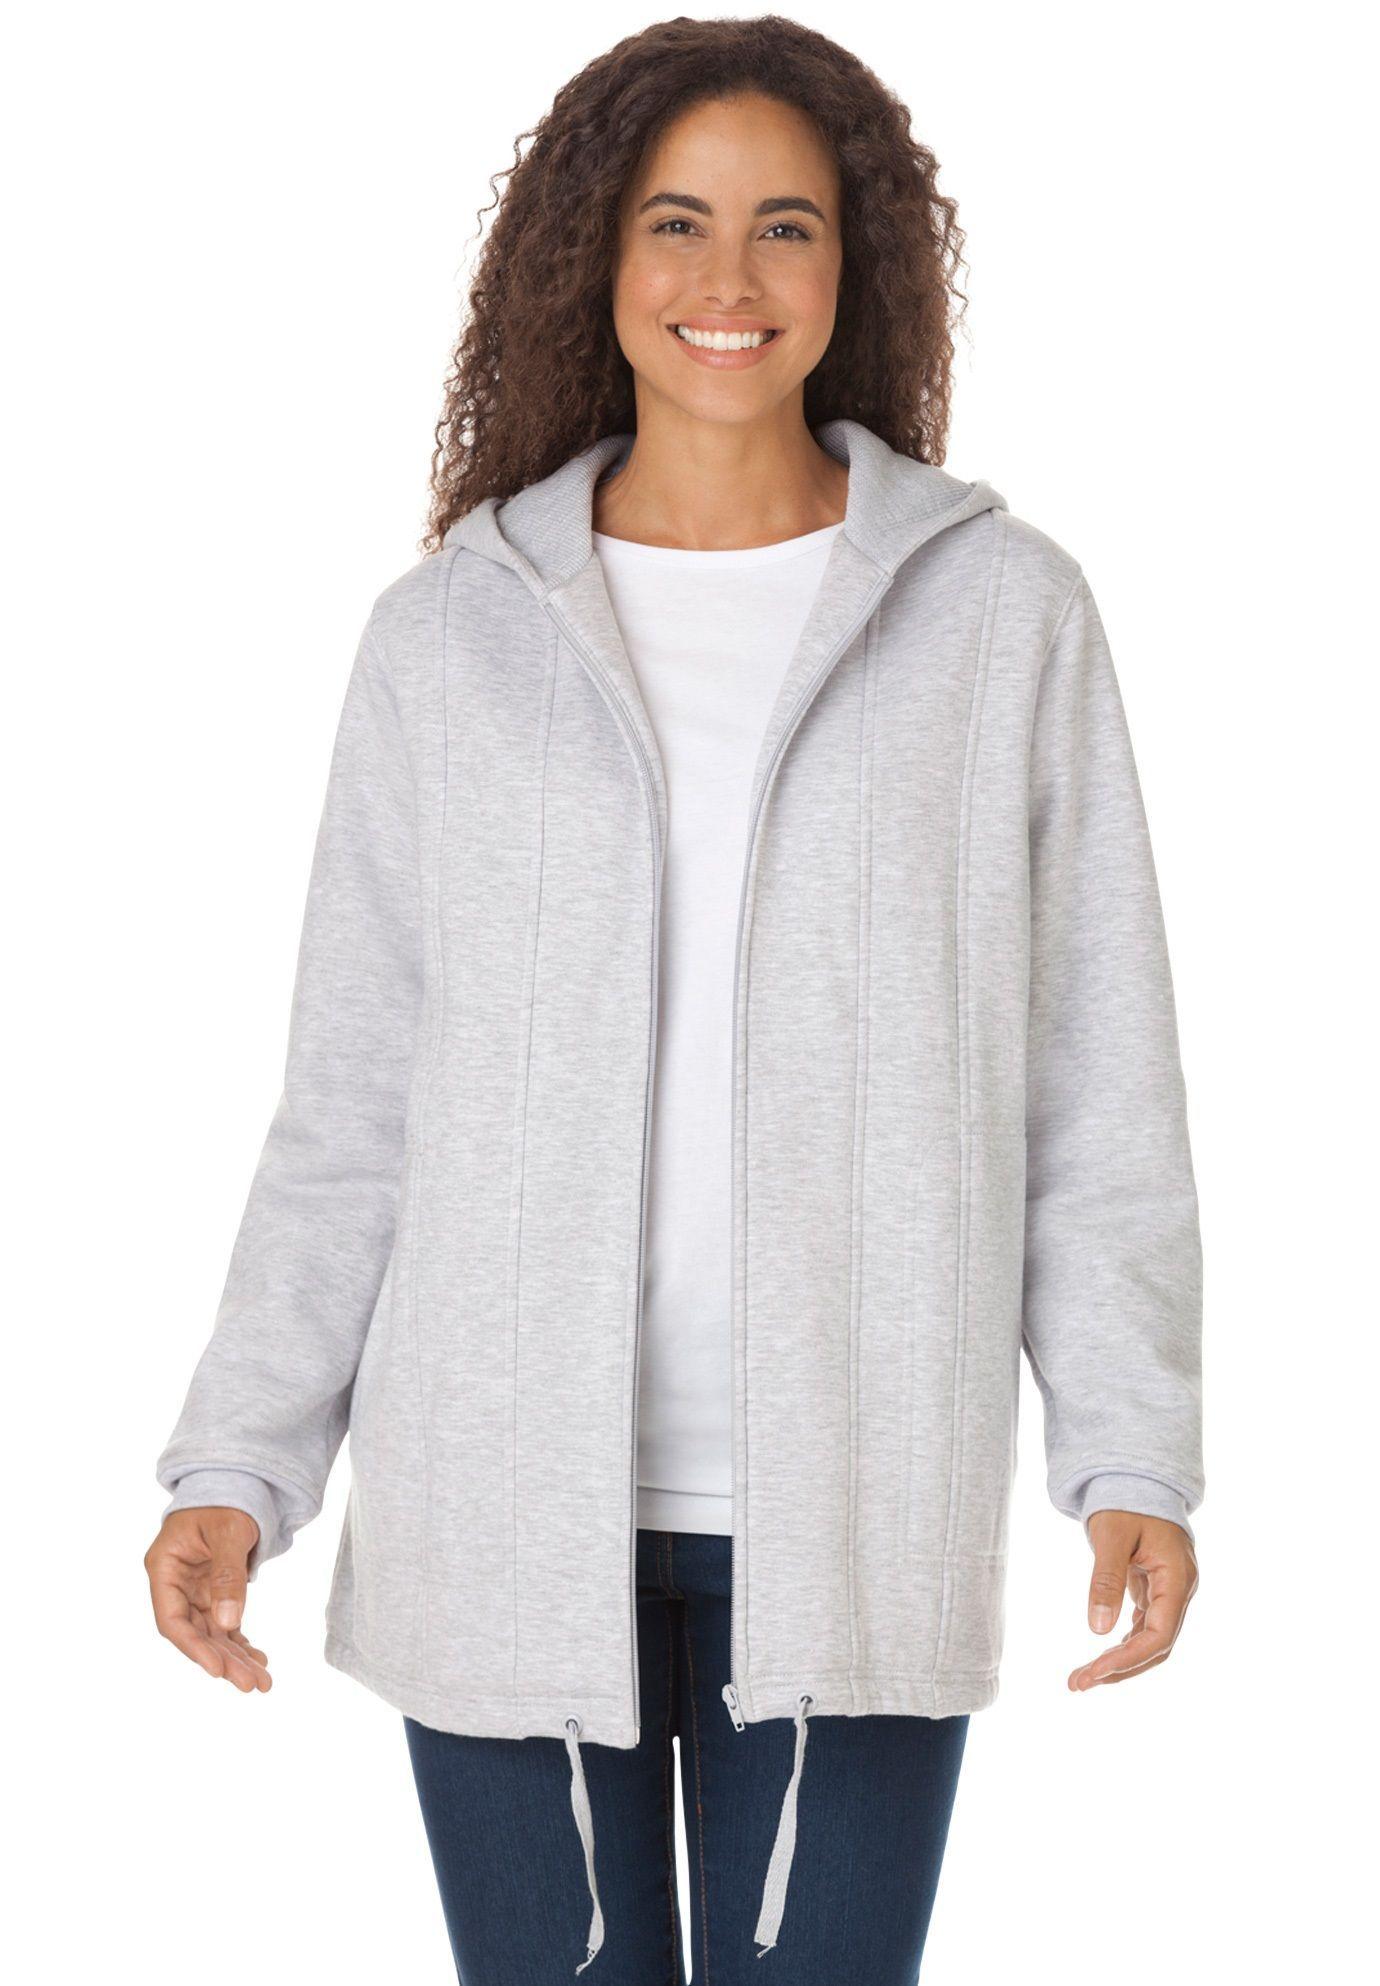 75f6caee7ce Drawstring-Hem Hooded Fleece Jacket - Women s Plus Size Clothing ...